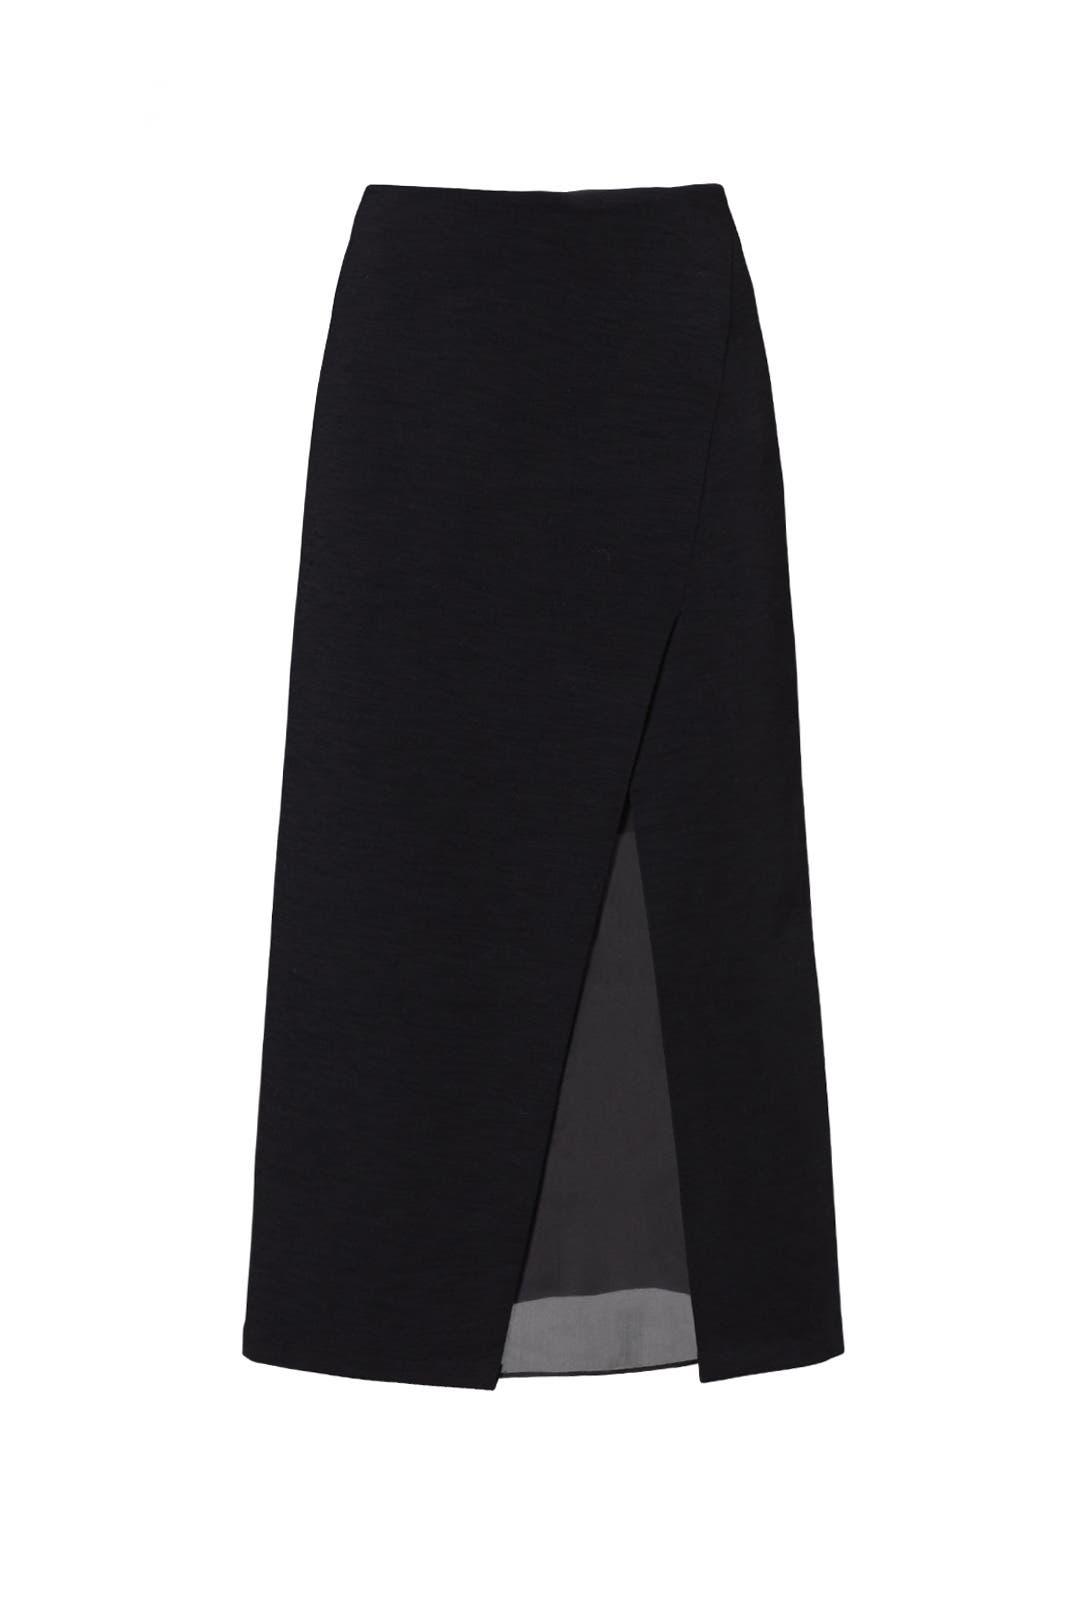 969225abf59779 Black Slit Shadow Pencil Skirt by Donna Karan New York for $180 ...